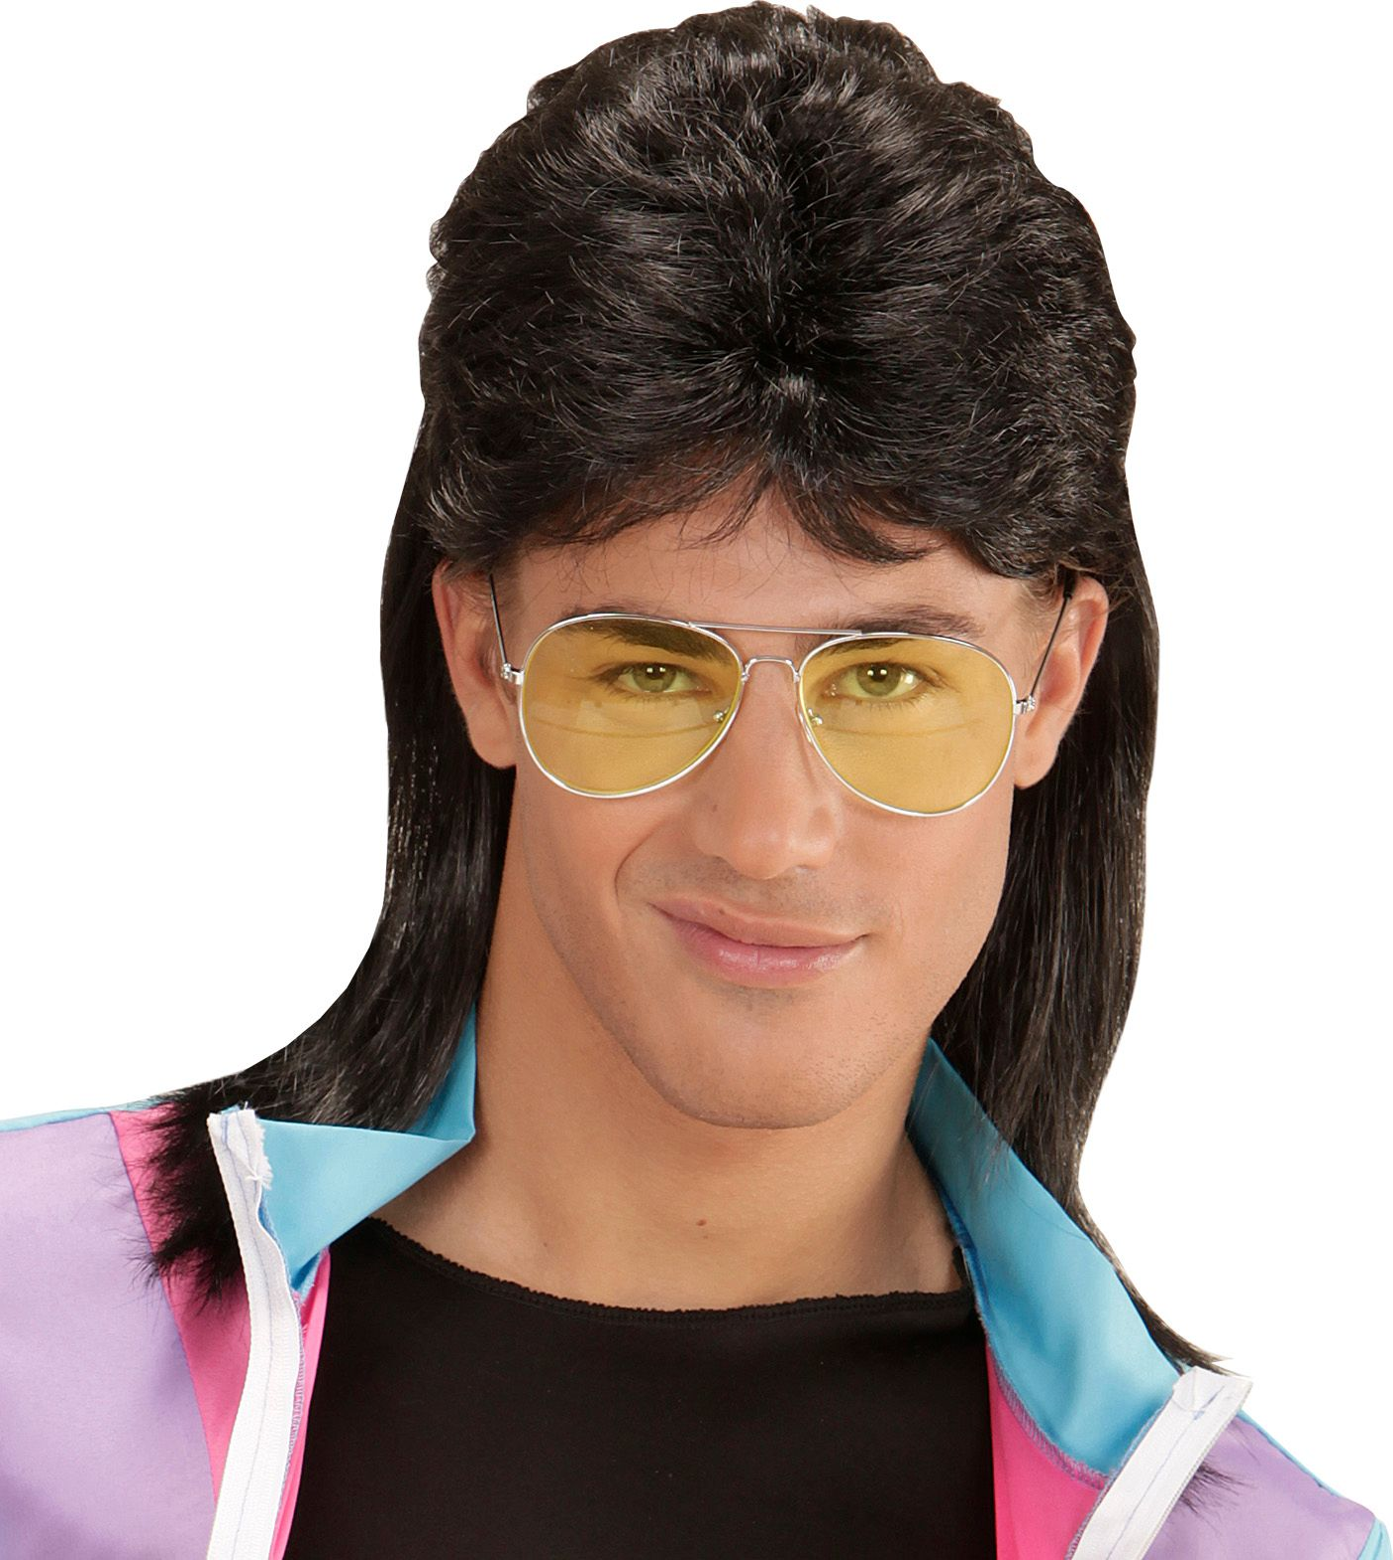 Zwarte New Kids pruik met bril